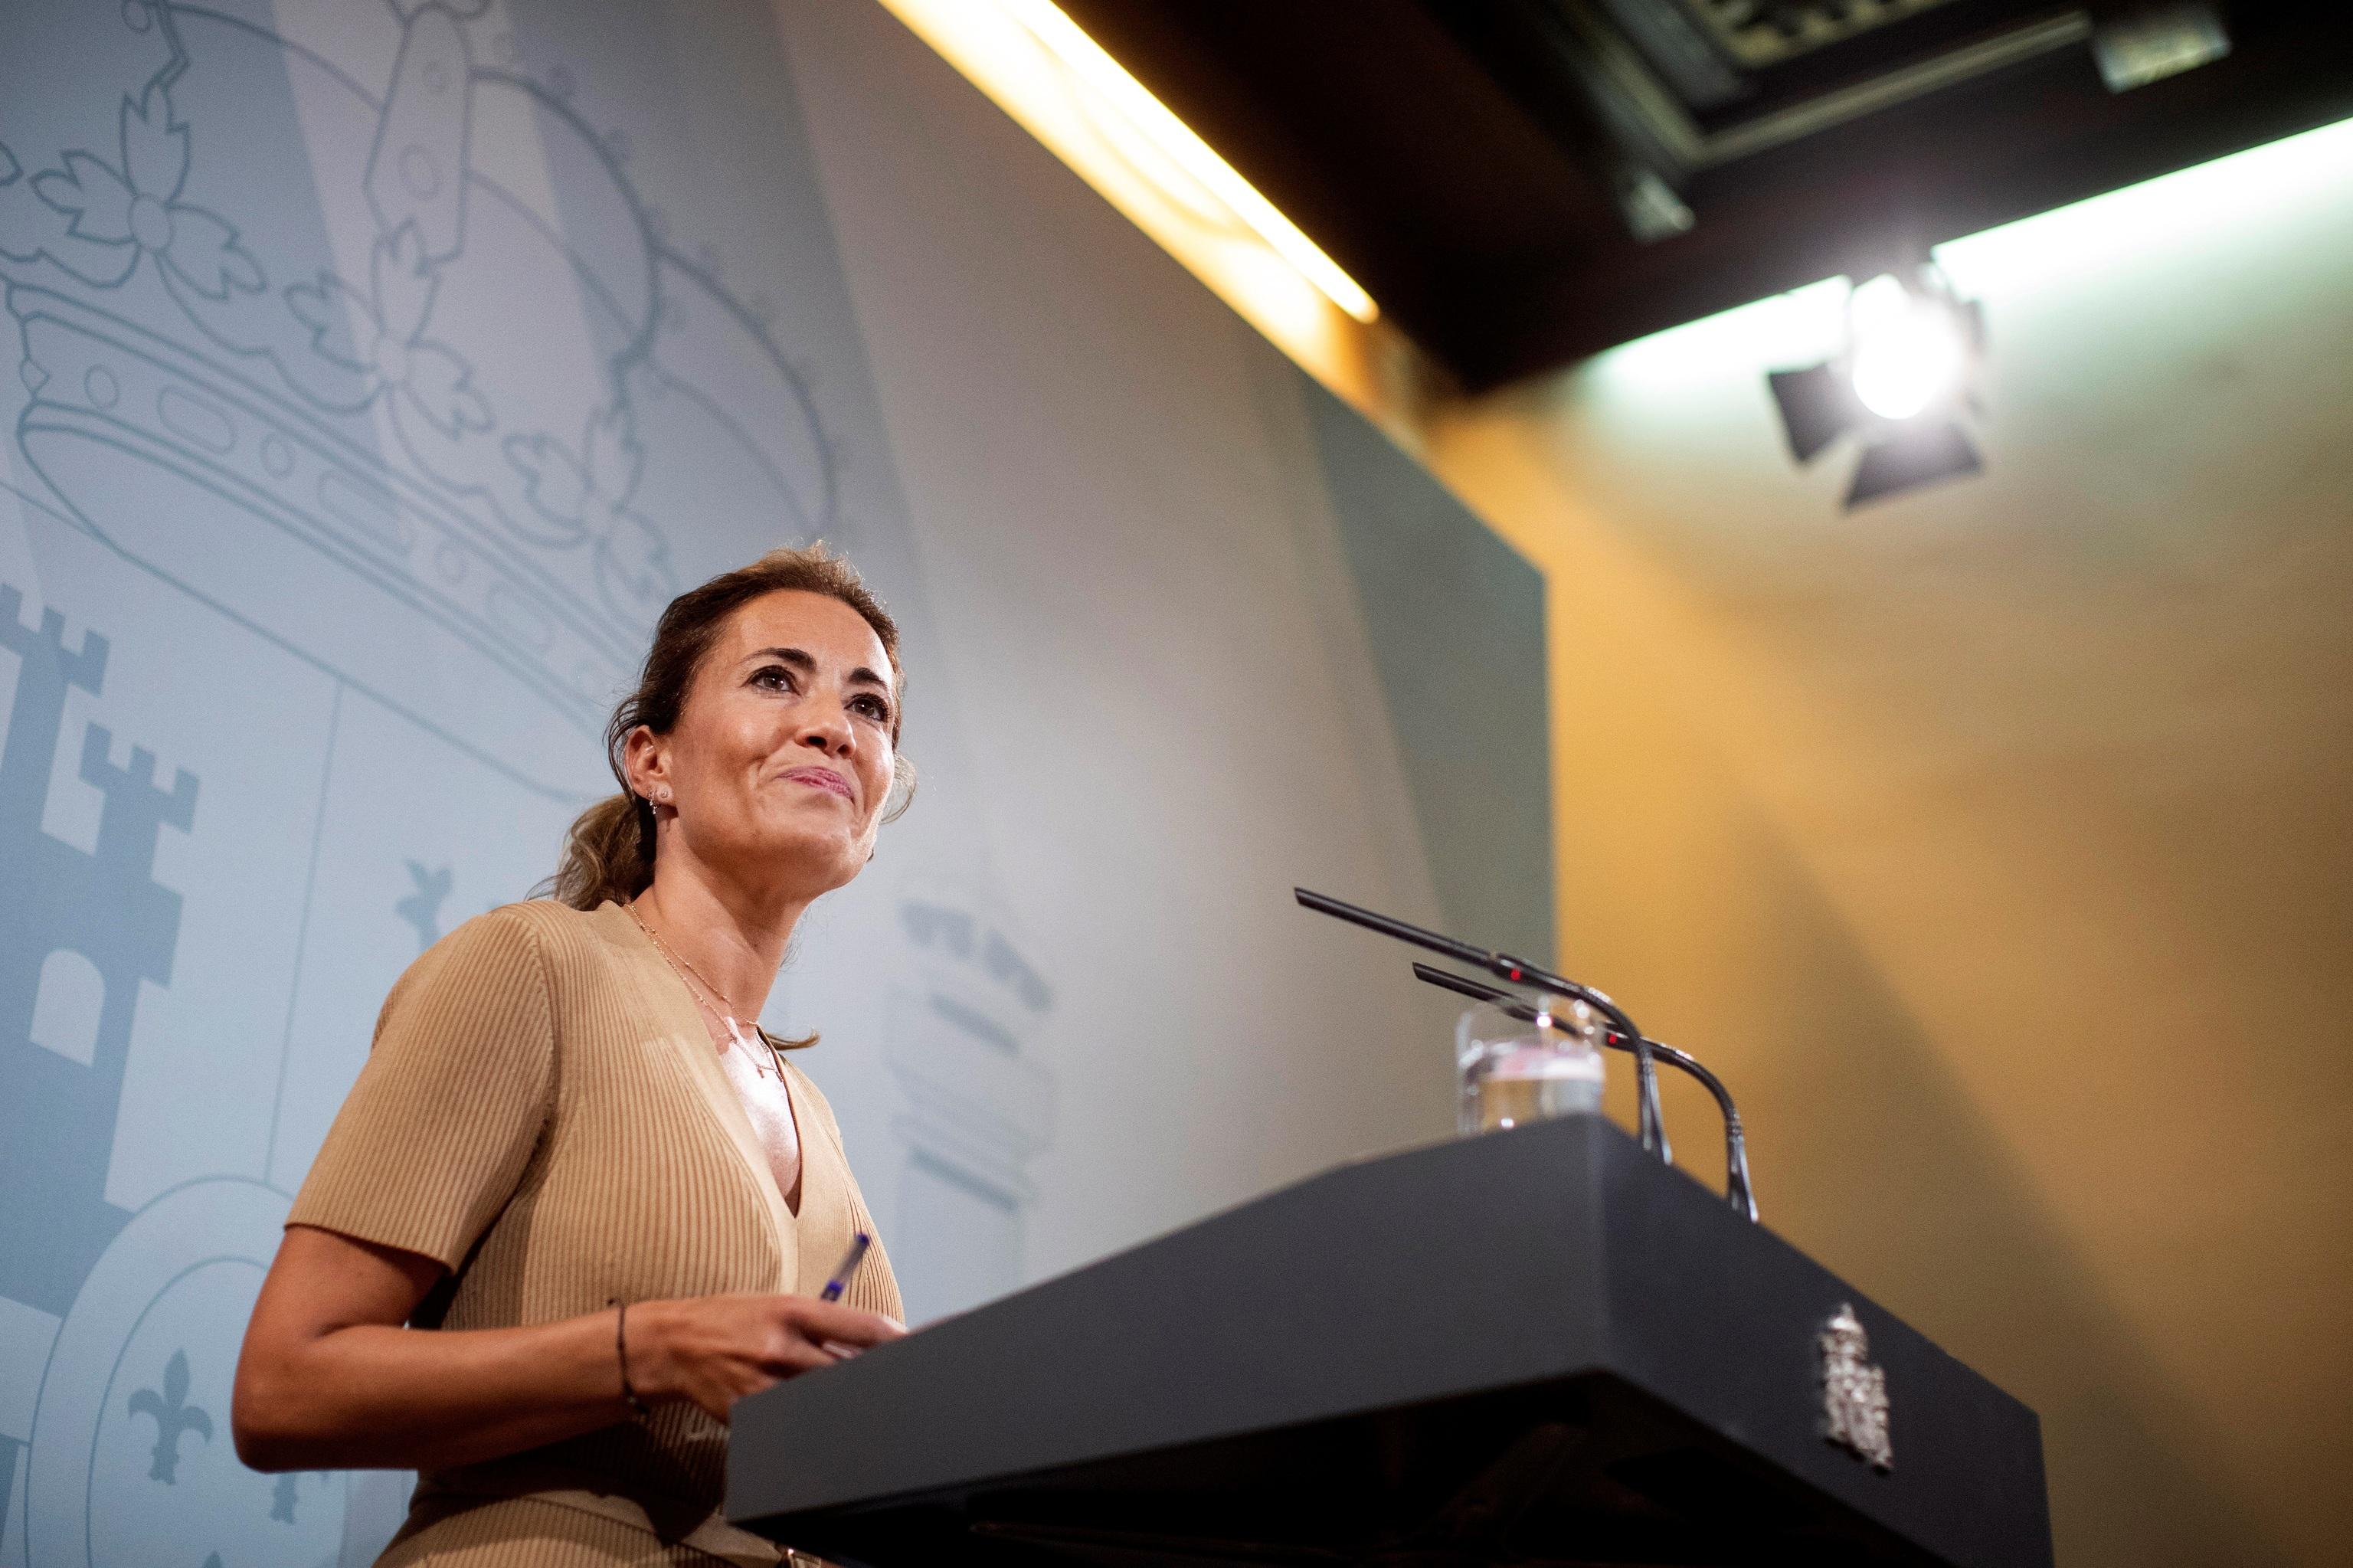 La ministra de Transportes, Raquel Sánchez, la semana pasada en Barcelona.